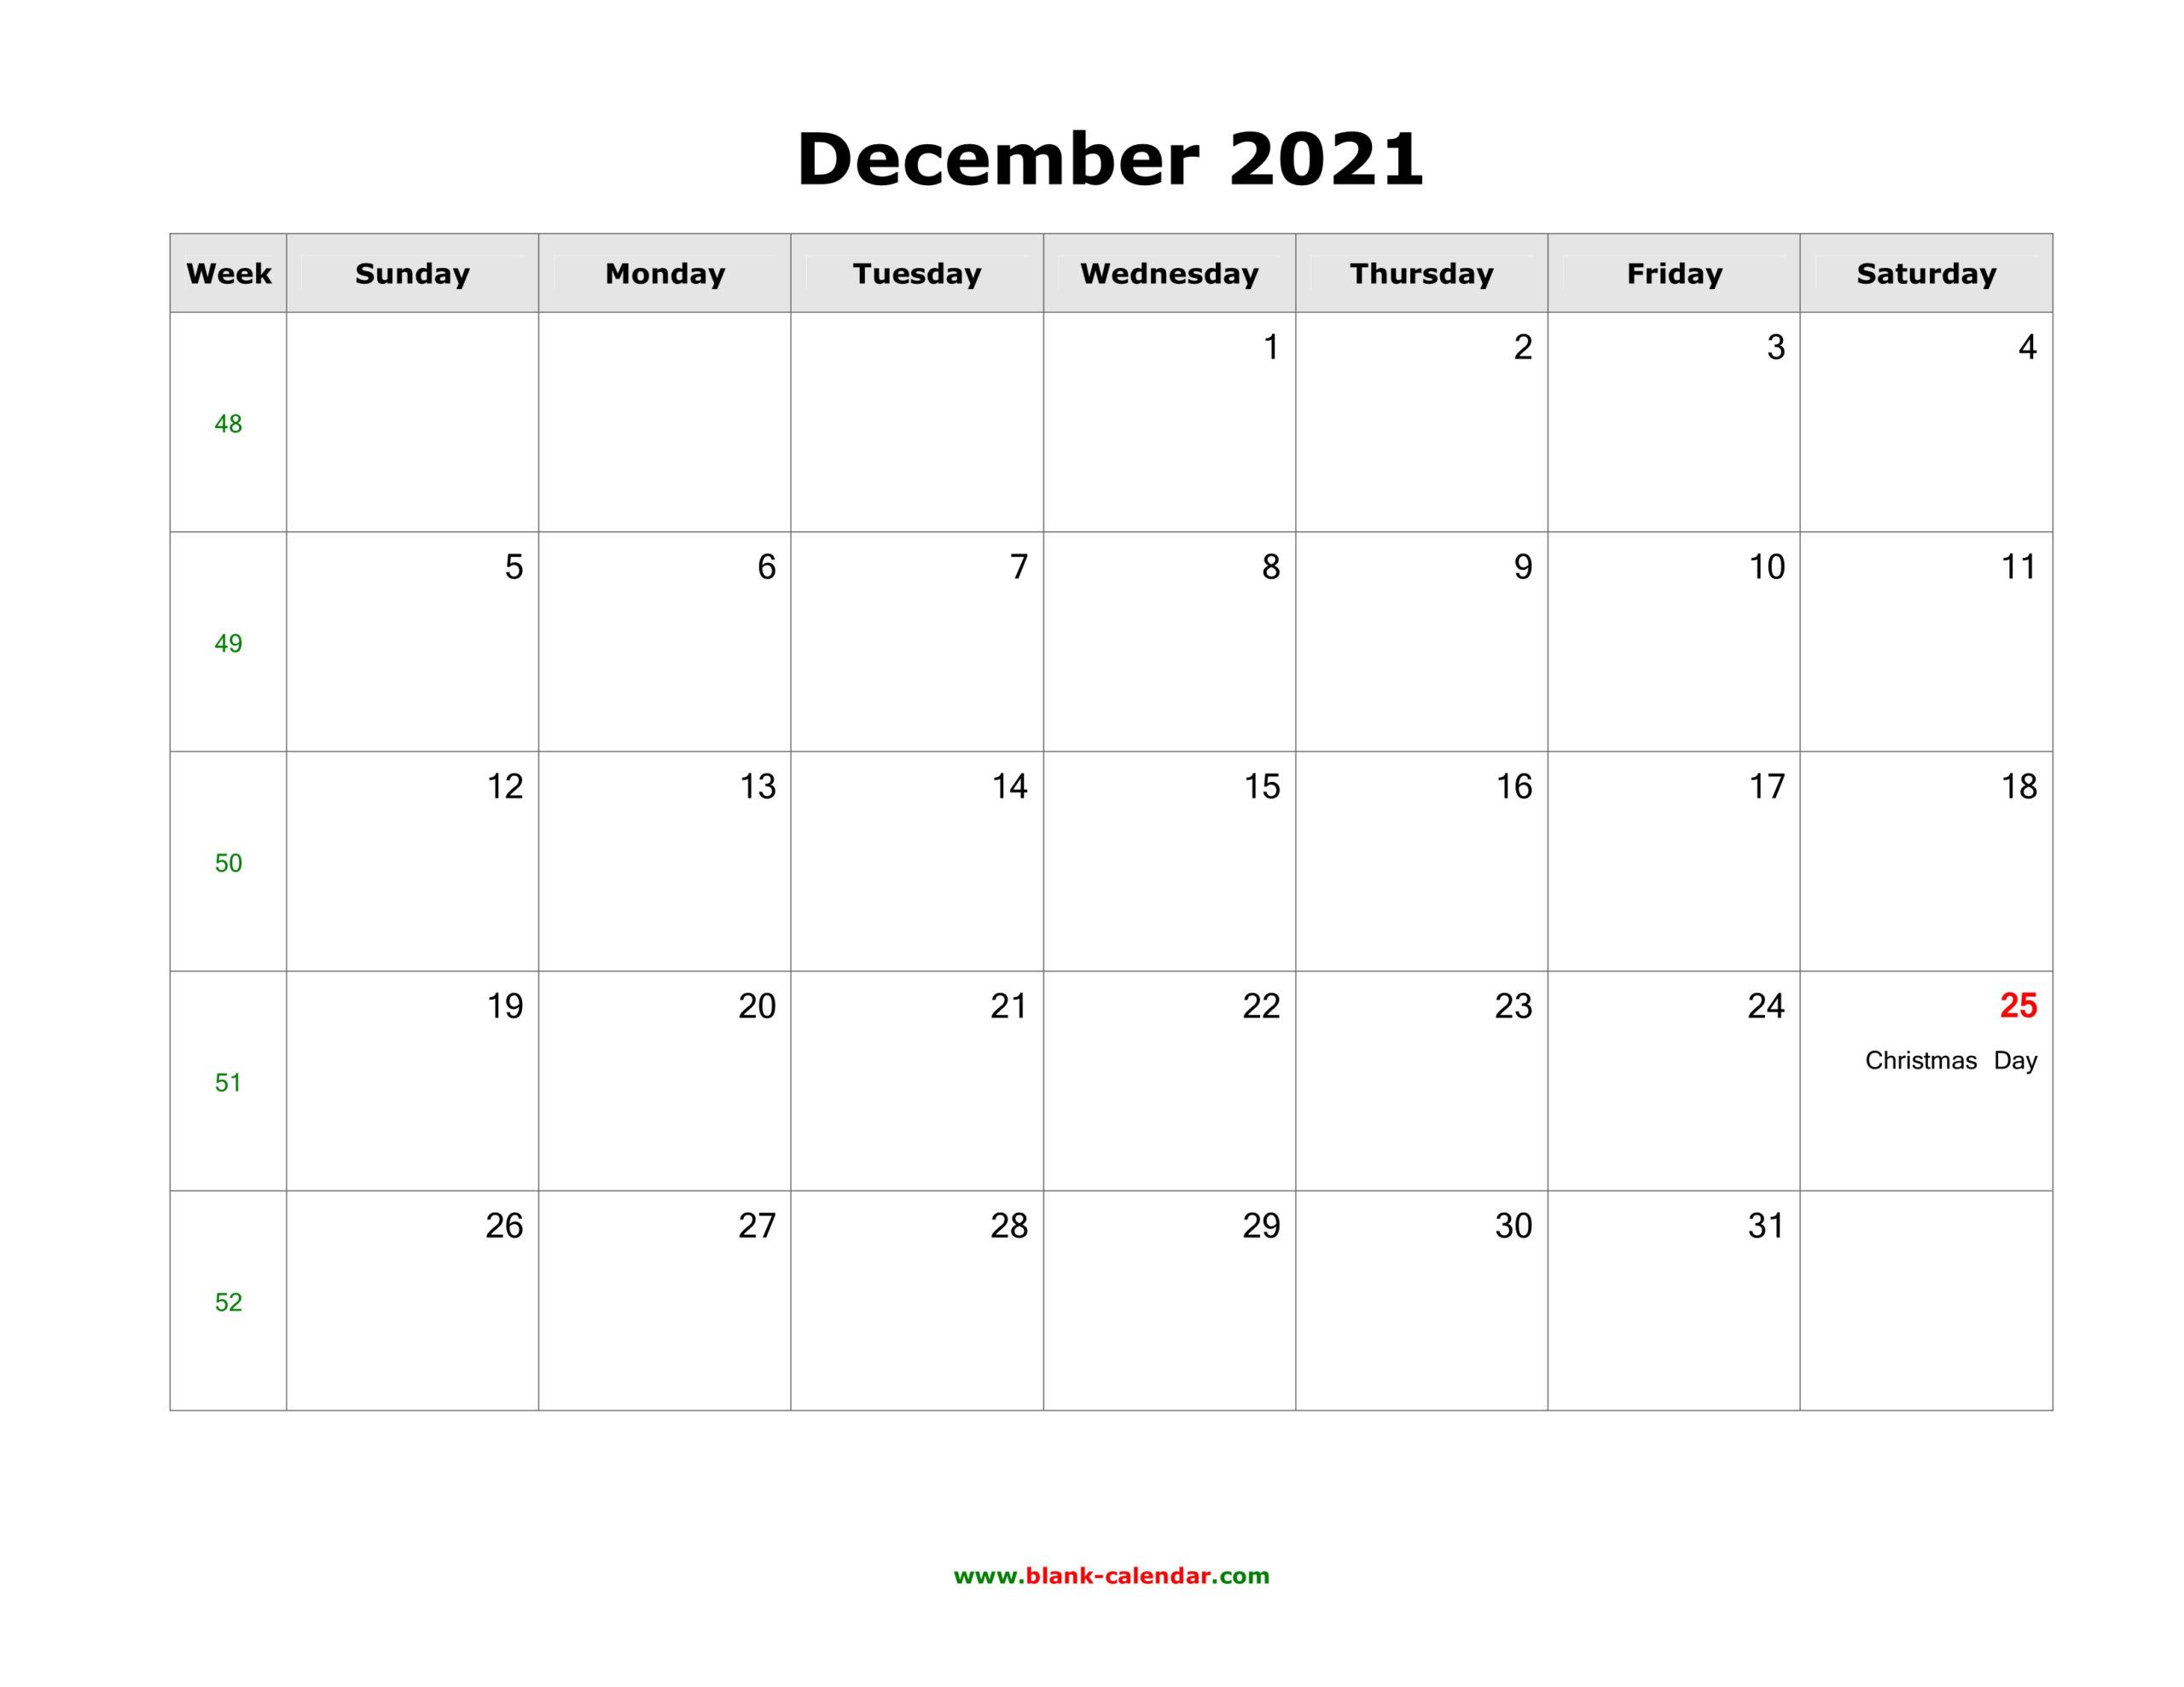 December 2021 Calendar With Holidays Usa | Printable March